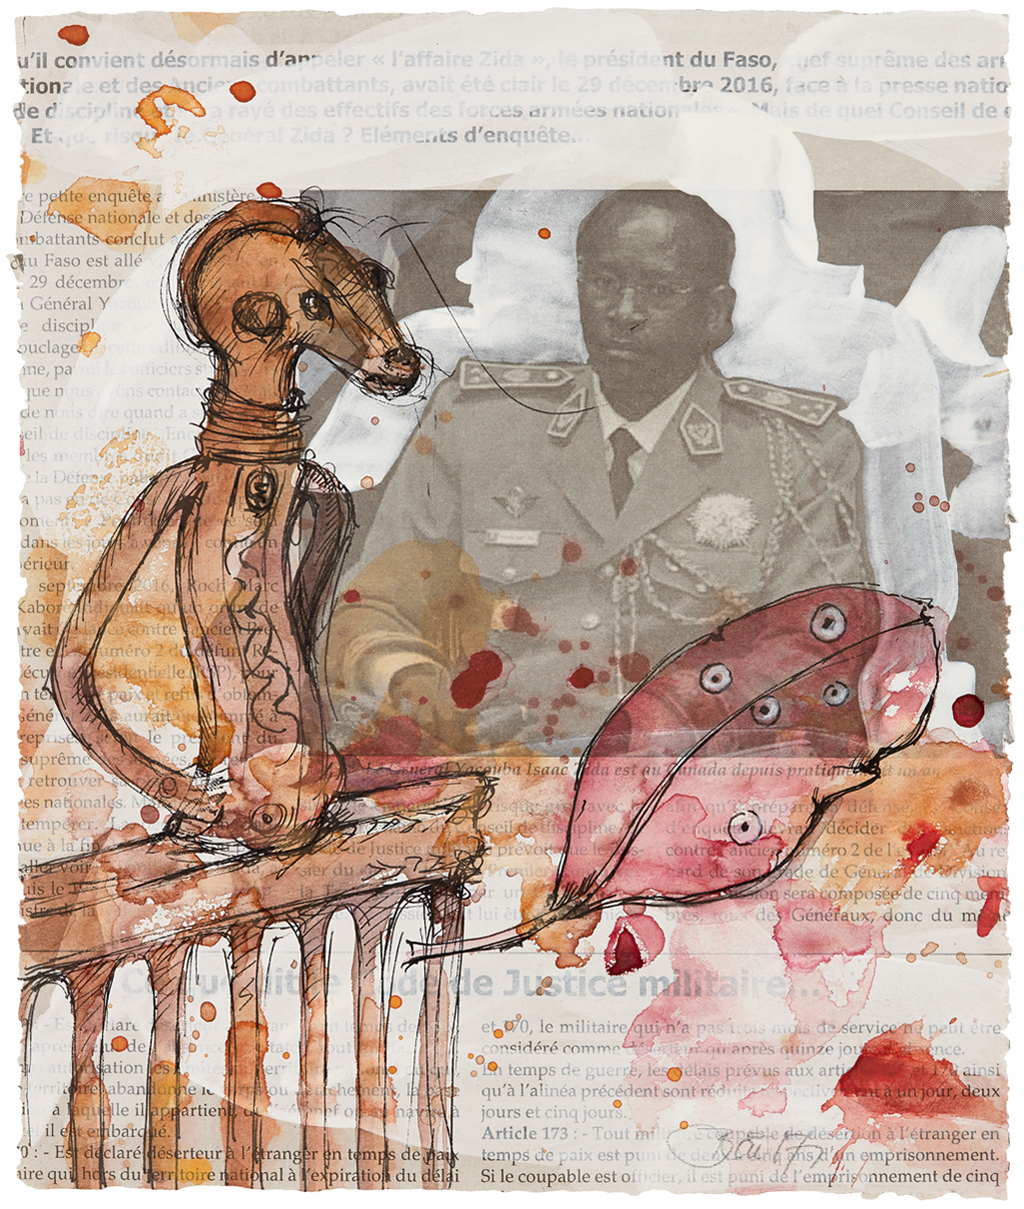 Les secrets de la residence – Burkina Faso I 2017, Acryl, Fineliner und Aquarell auf Zeitungspapier, 28 x 21 cm